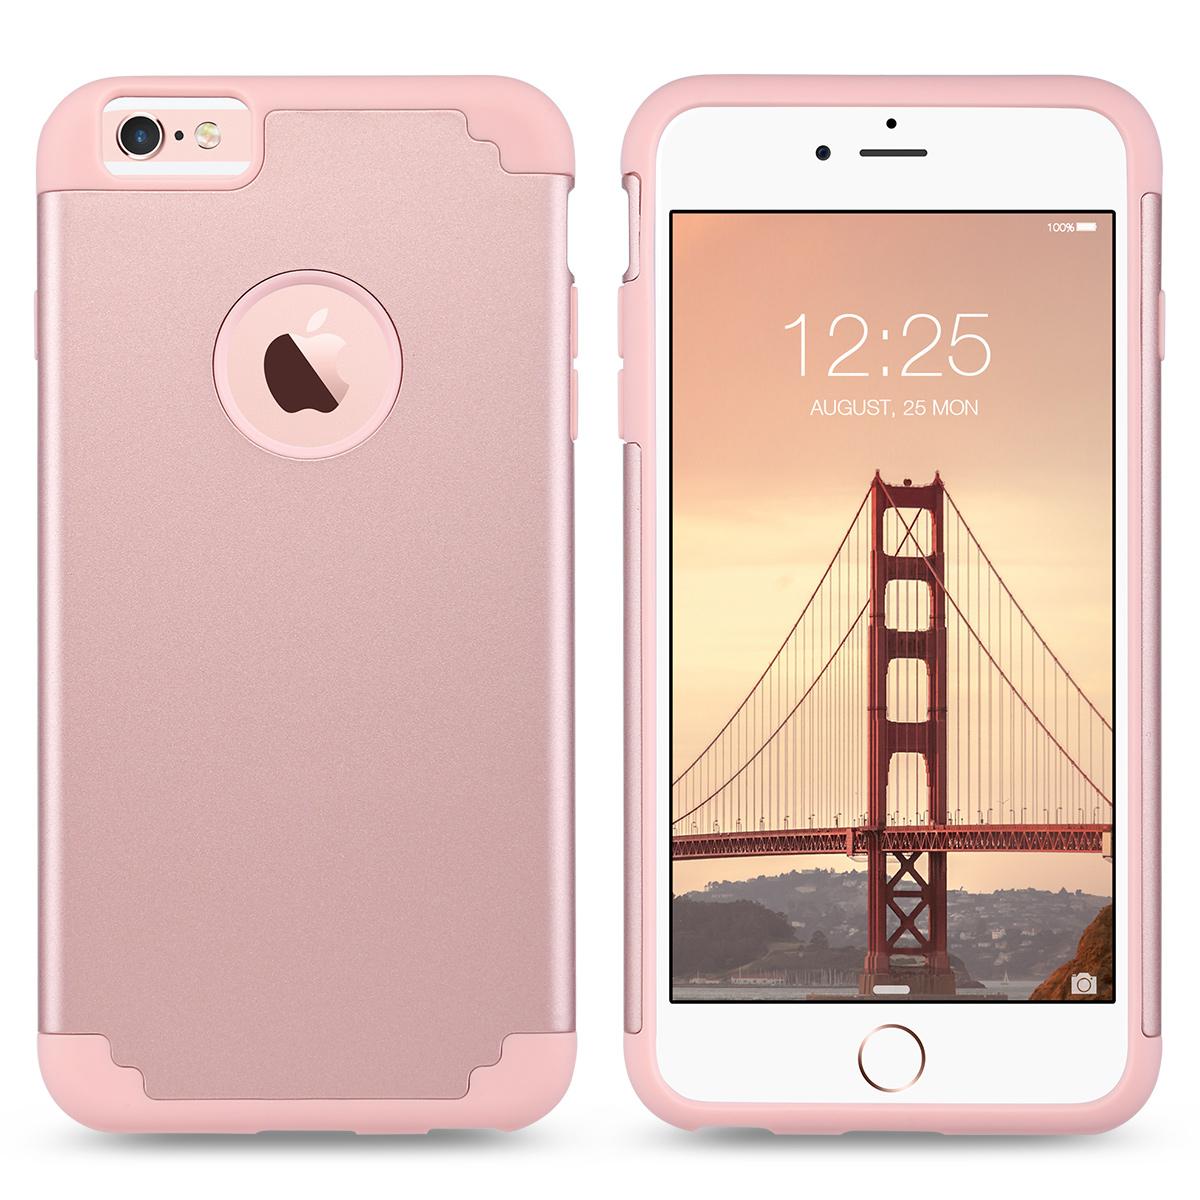 info for e36fd 549a5 Iphone 6 plus rose gold case ebay – Modeschmuck